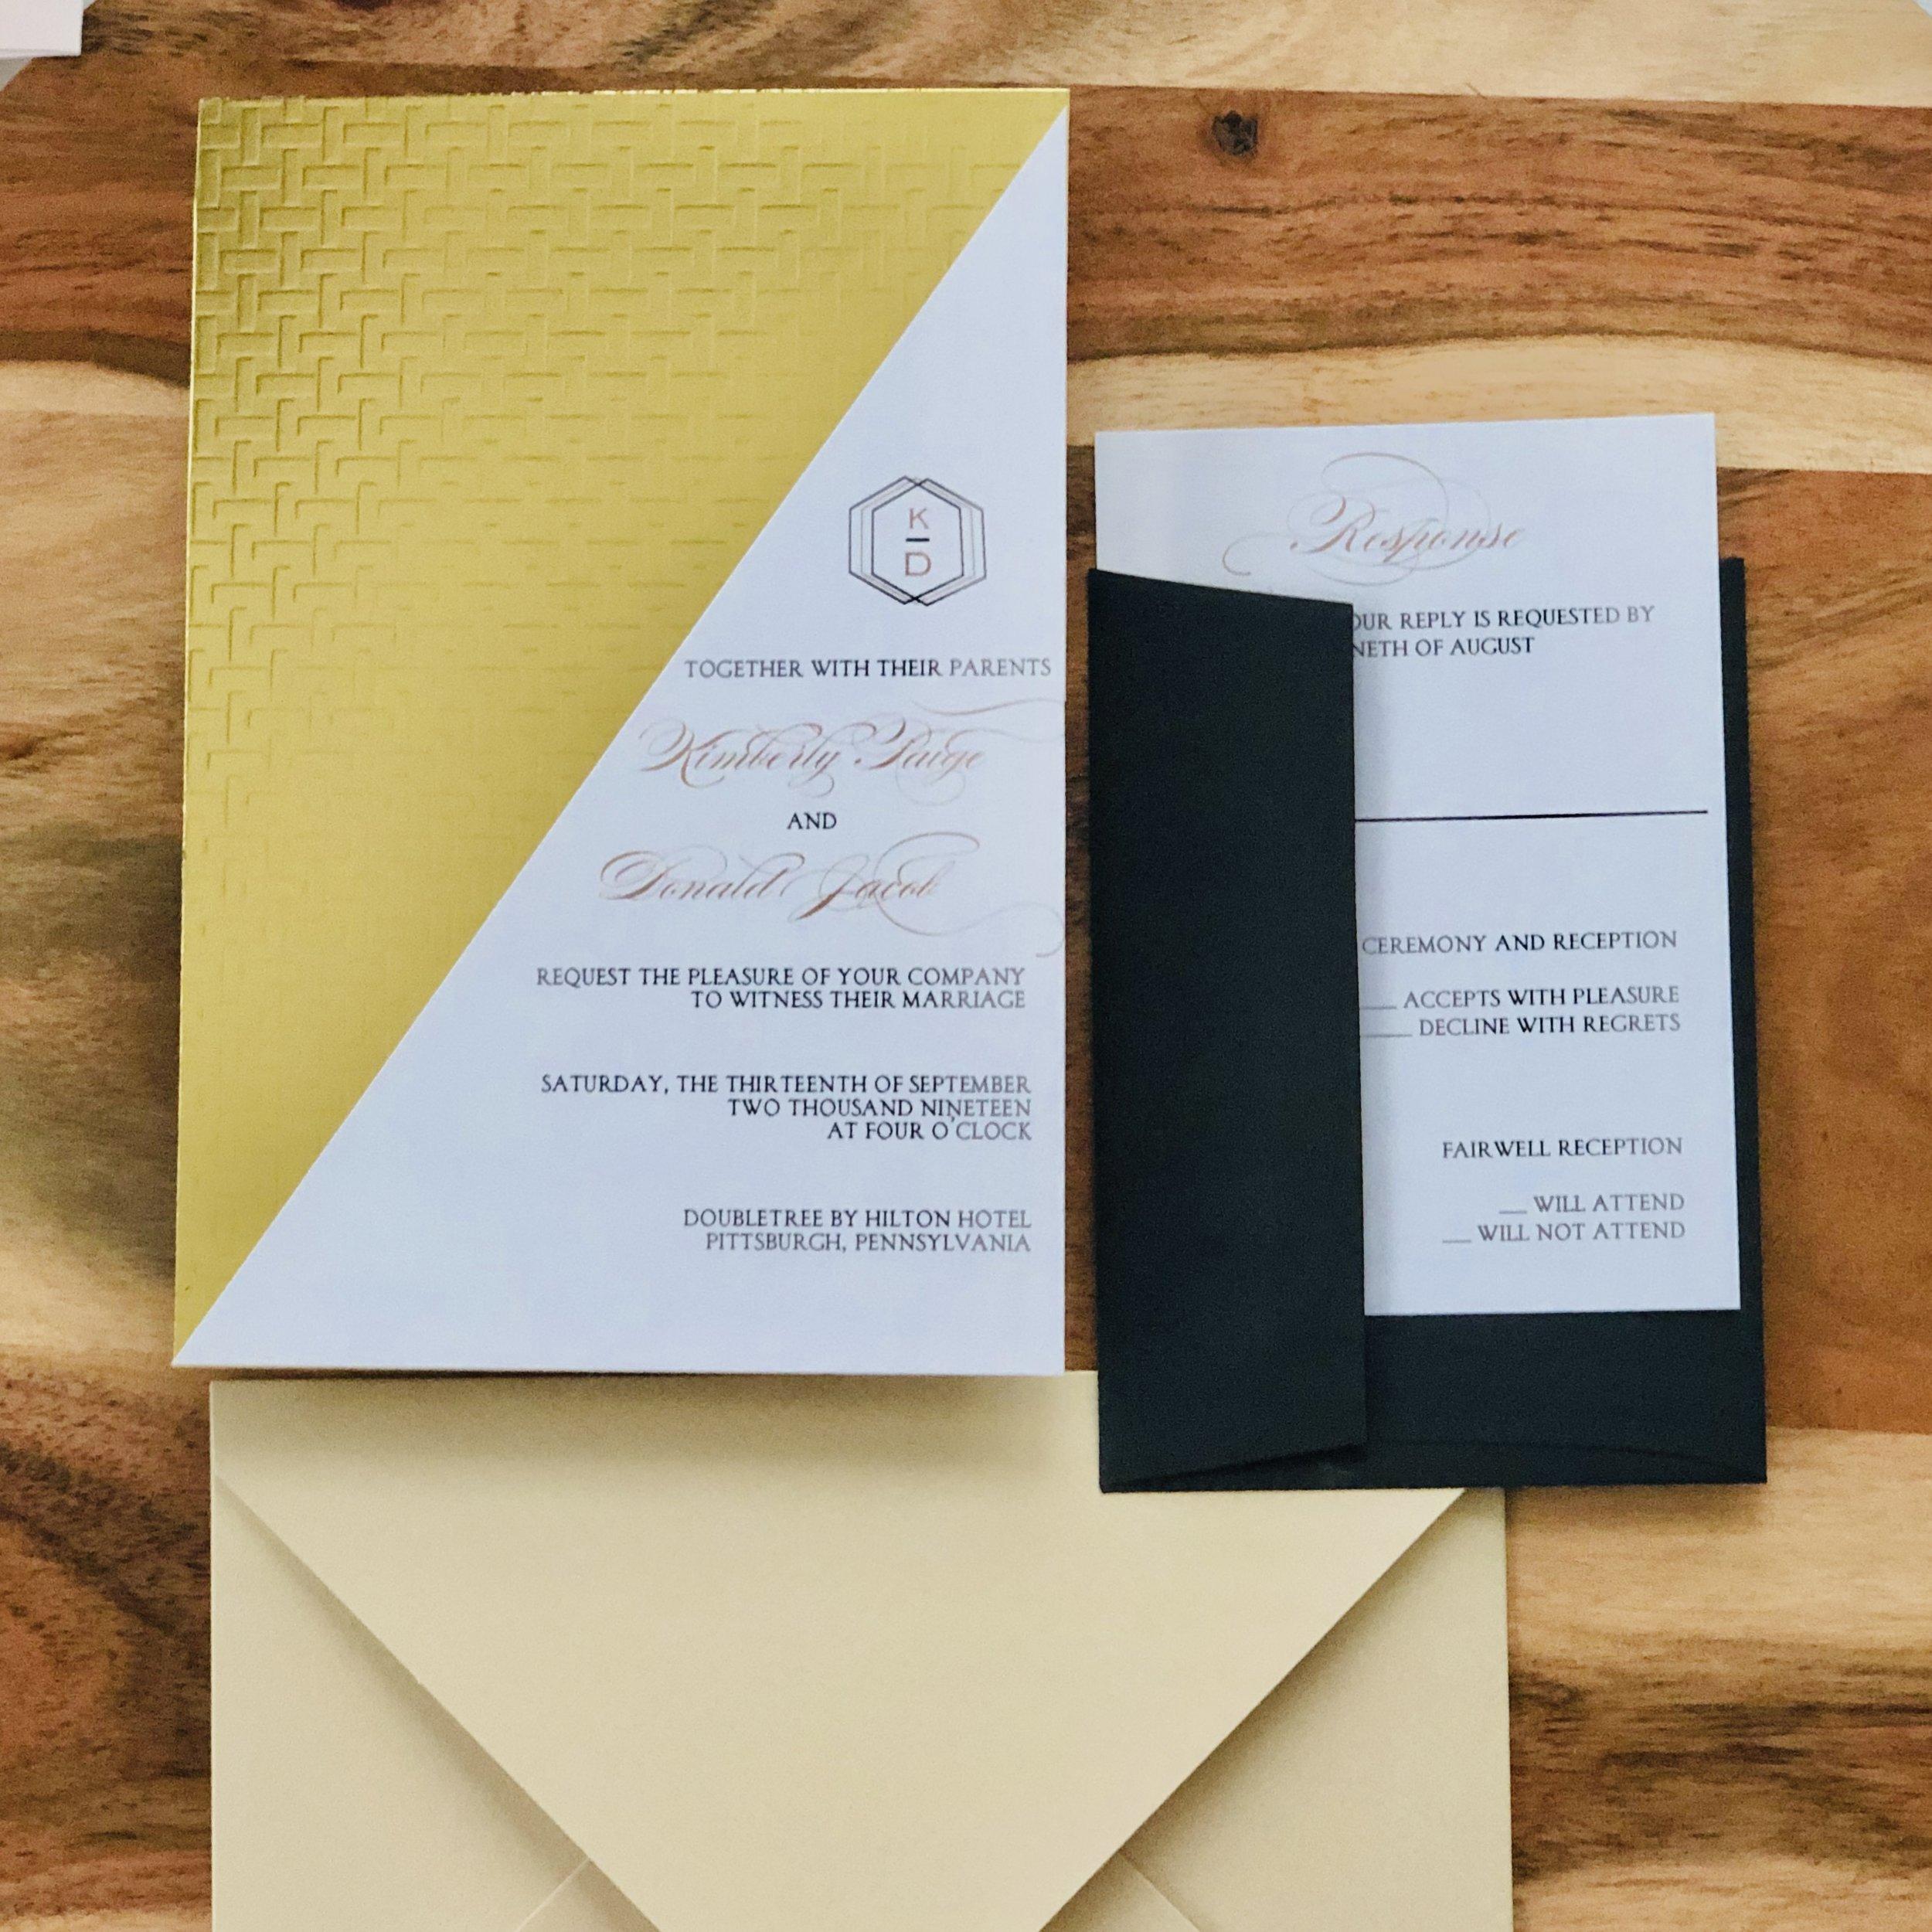 Modern-Glam-Black-and-Gold-Wedding-Invitation-by-K-Flowers-Designs2